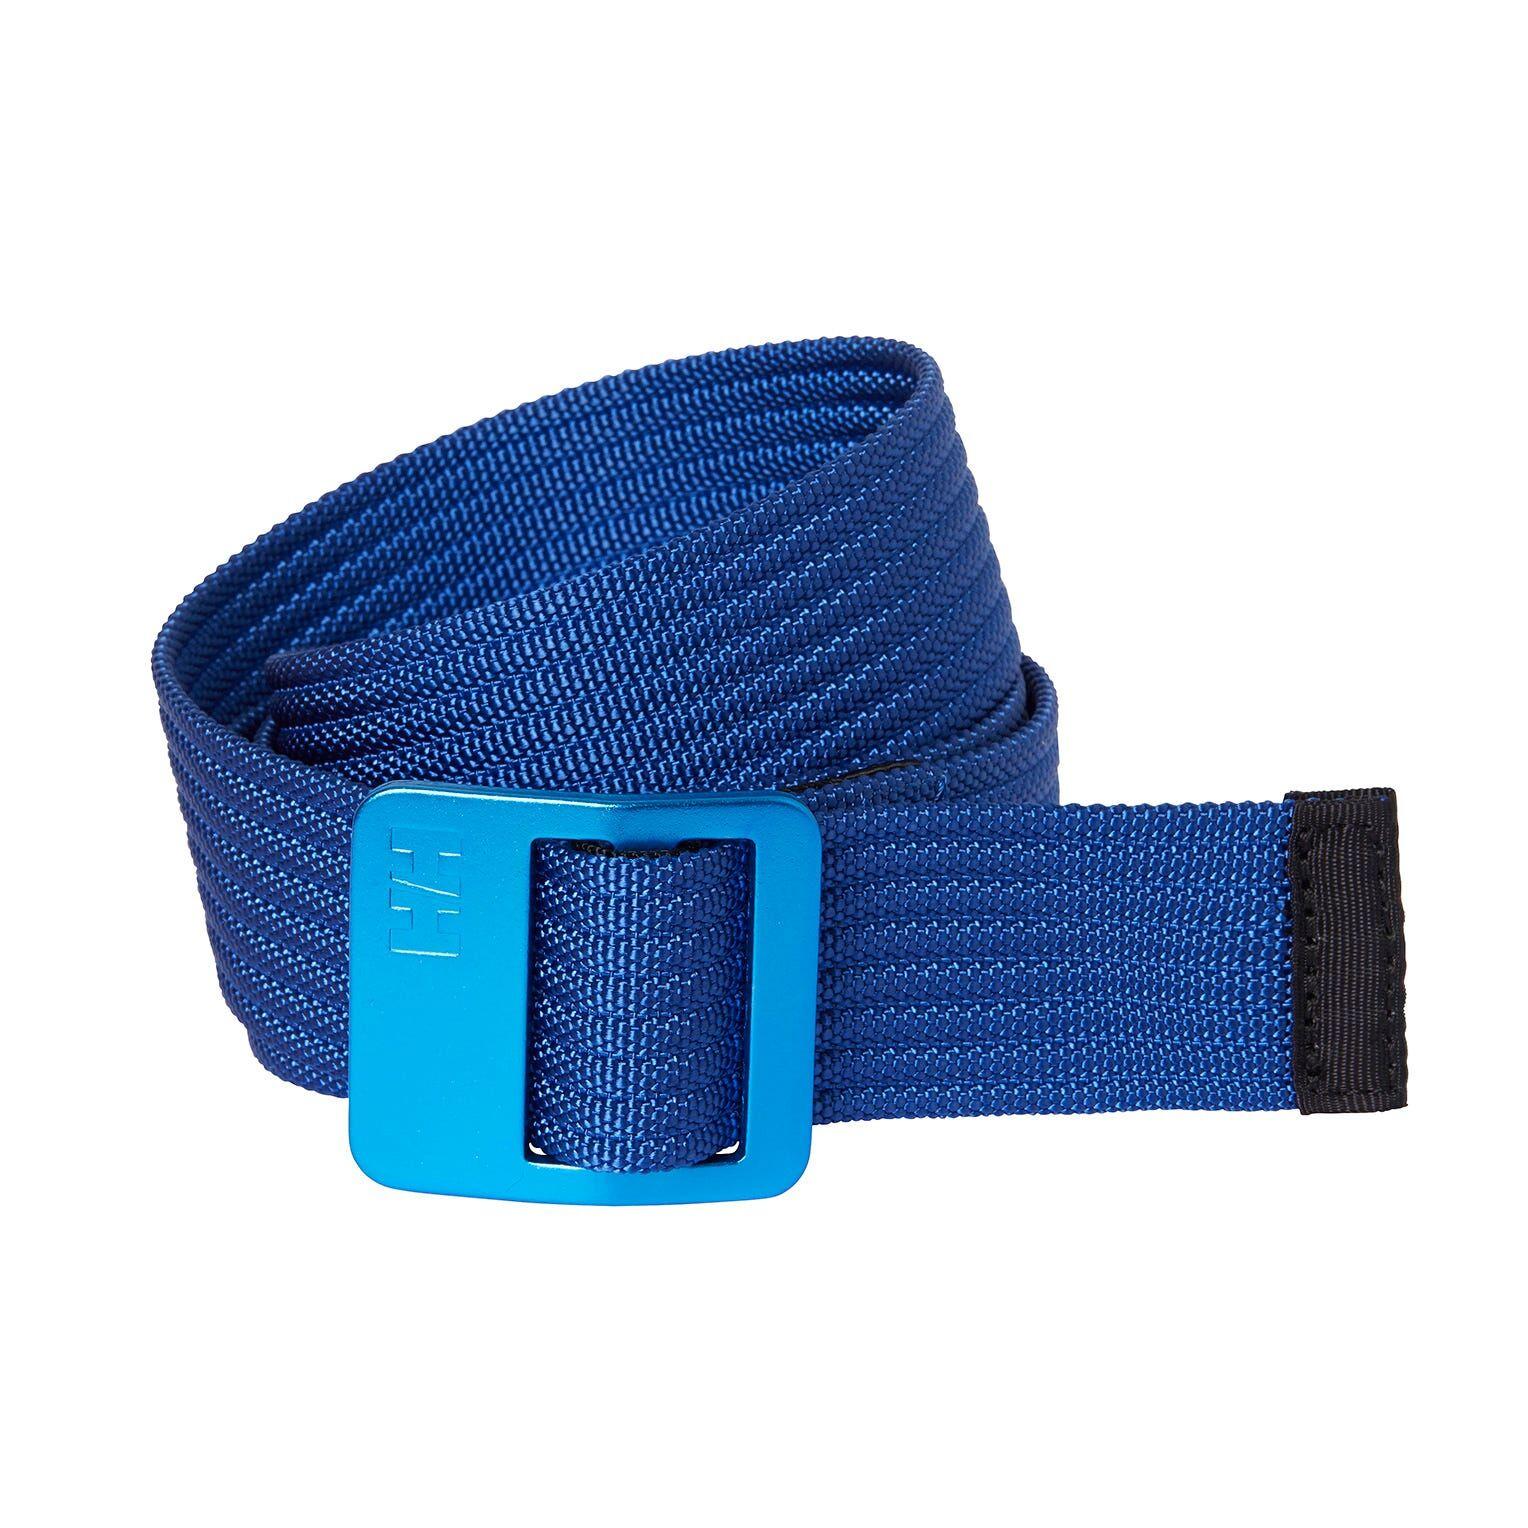 Helly Hansen Webbing Belt Blue 130